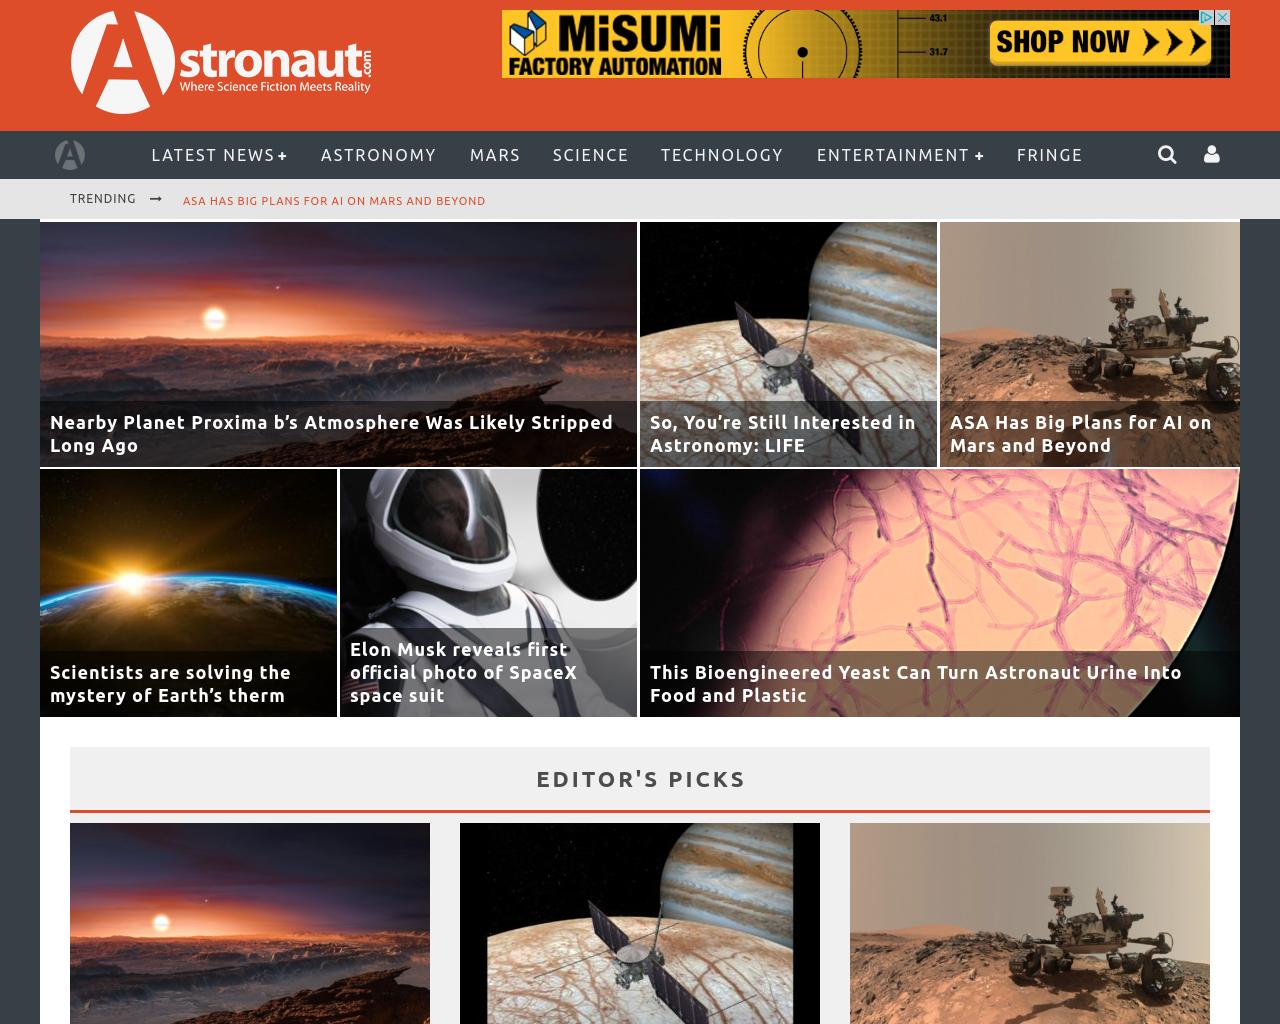 Astronaut.com-Advertising-Reviews-Pricing